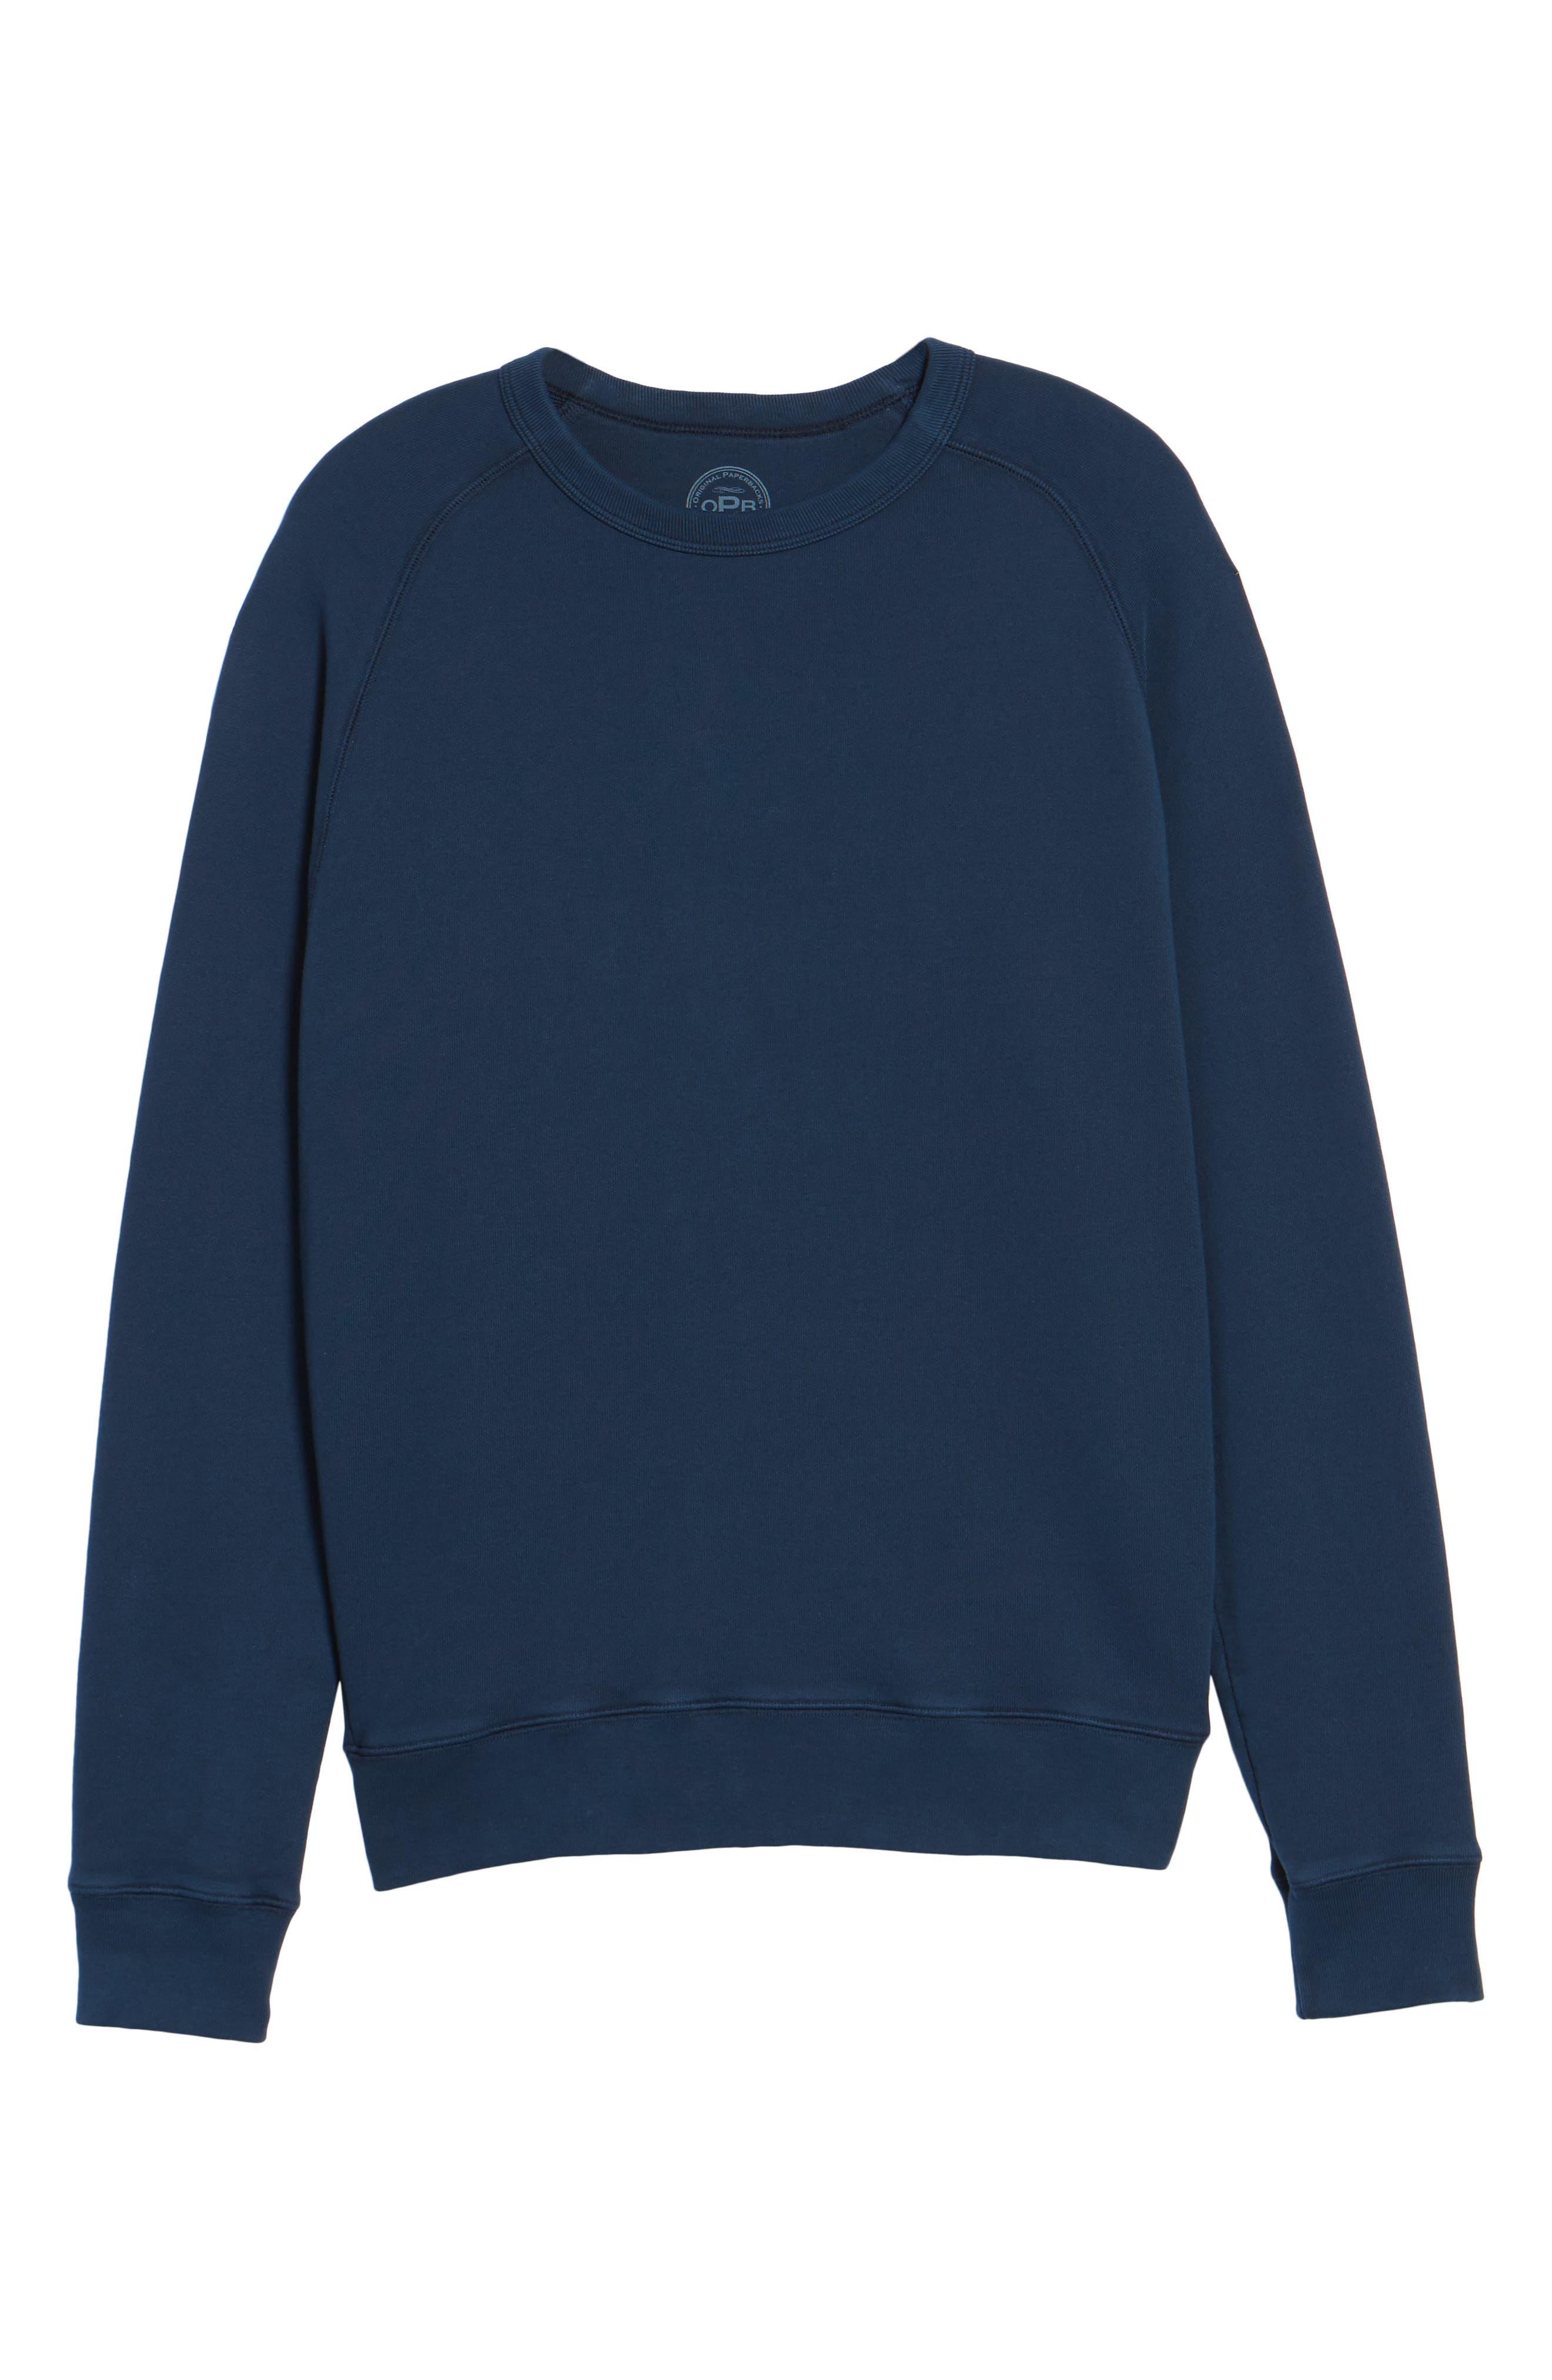 Alternate Image 1 Selected - Original Paperbacks South Sea Raglan Sweatshirt